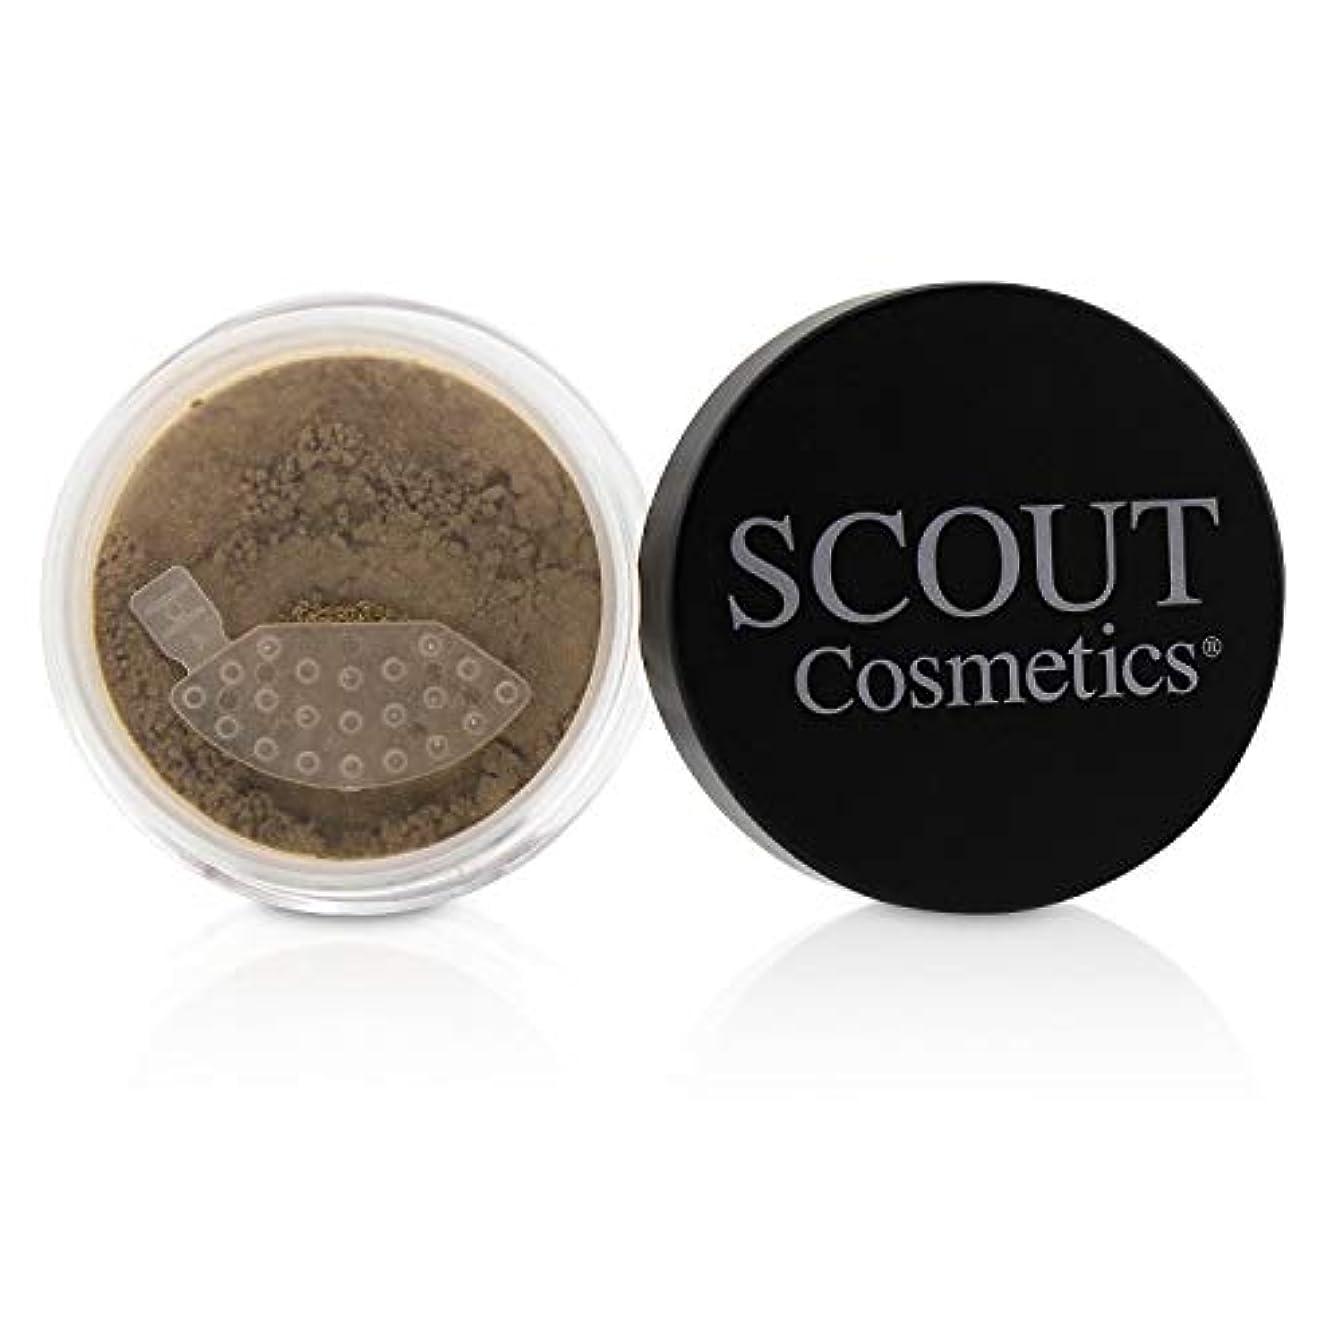 大腿理由結果SCOUT Cosmetics Mineral Powder Foundation SPF 20 - # Almond 8g/0.28oz並行輸入品